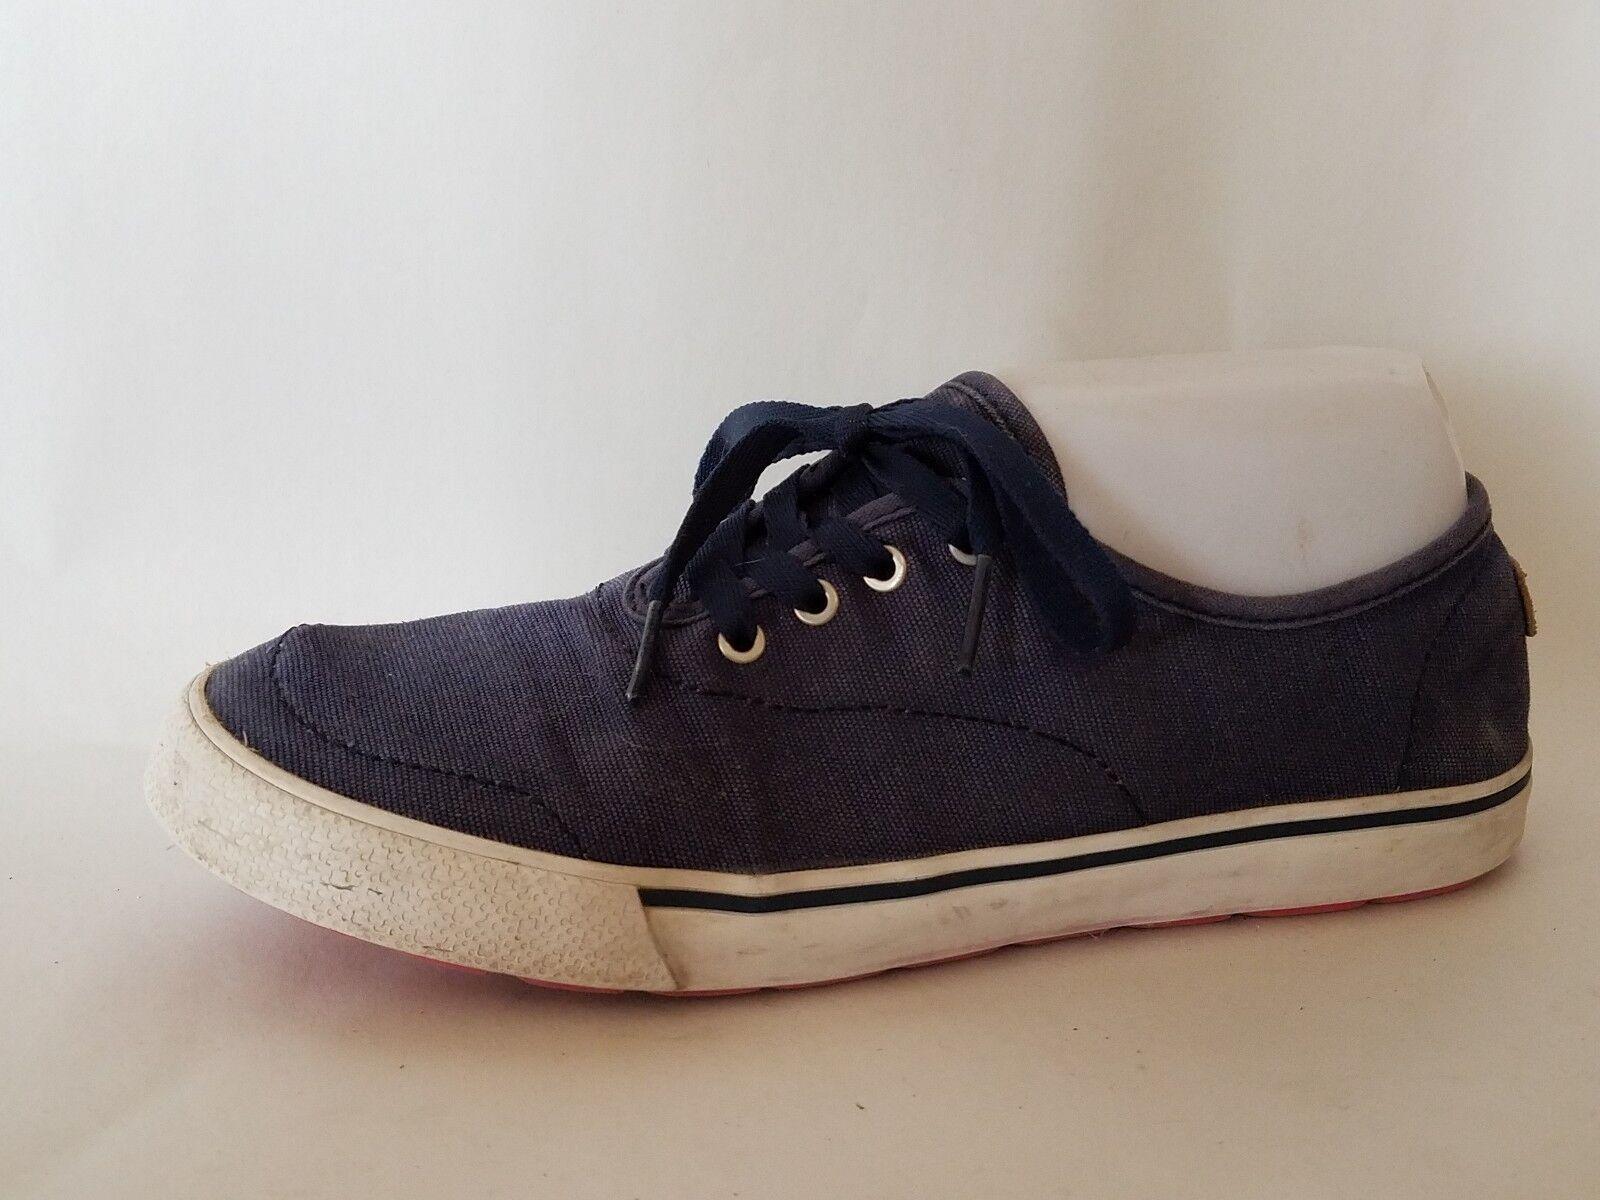 Skechers GoGa Mat Navy bluee Womens 7 Med Running shoes Sneaker 13732 Casual Walk